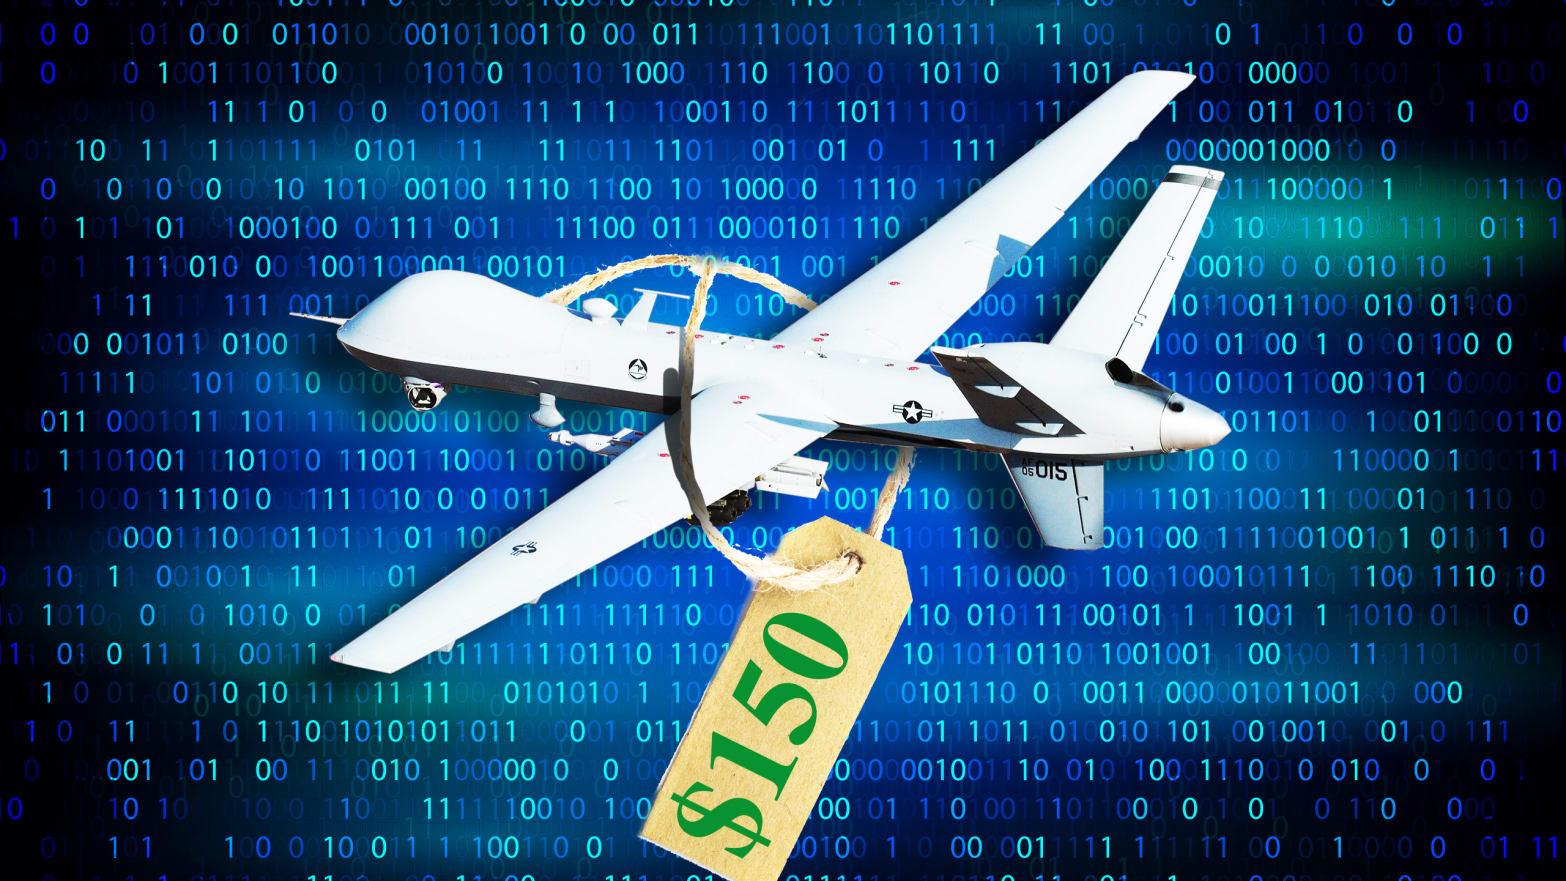 Hacker Selling Pentagon's Killer Drone Manual on Dark Web for $150